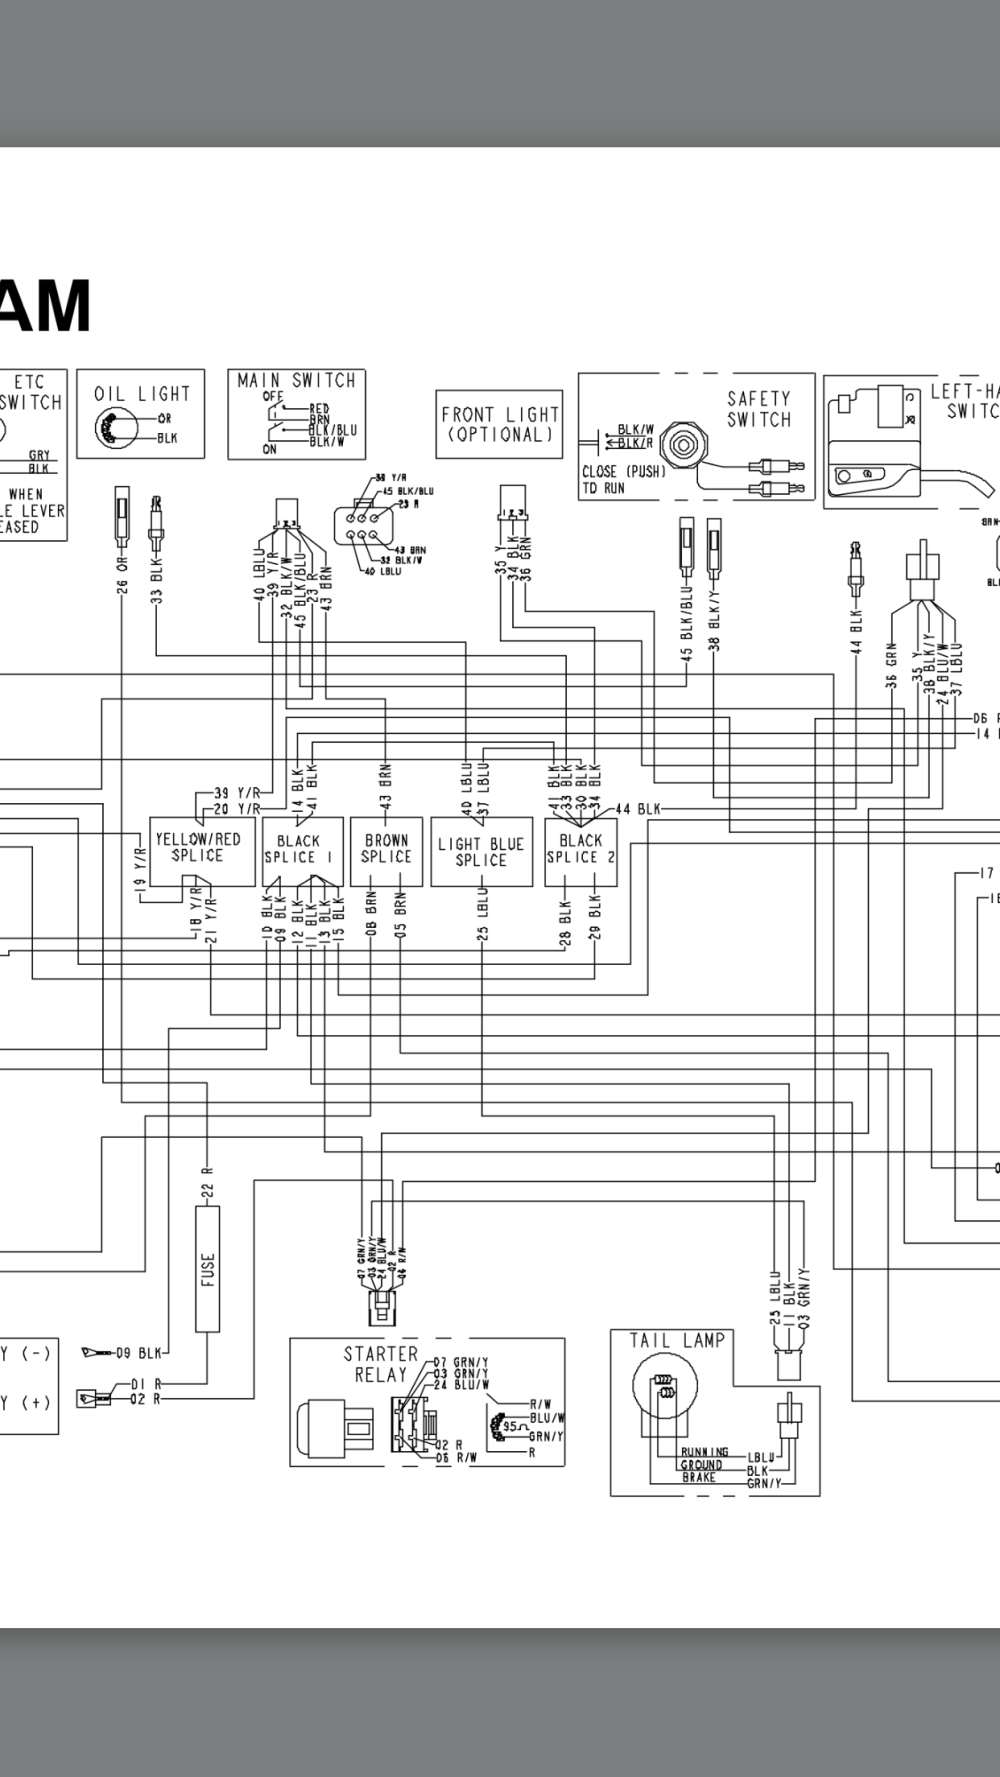 medium resolution of 2001 polaris scrambler wiring diagram 1997 polaris 500 scrambler wiring diagram